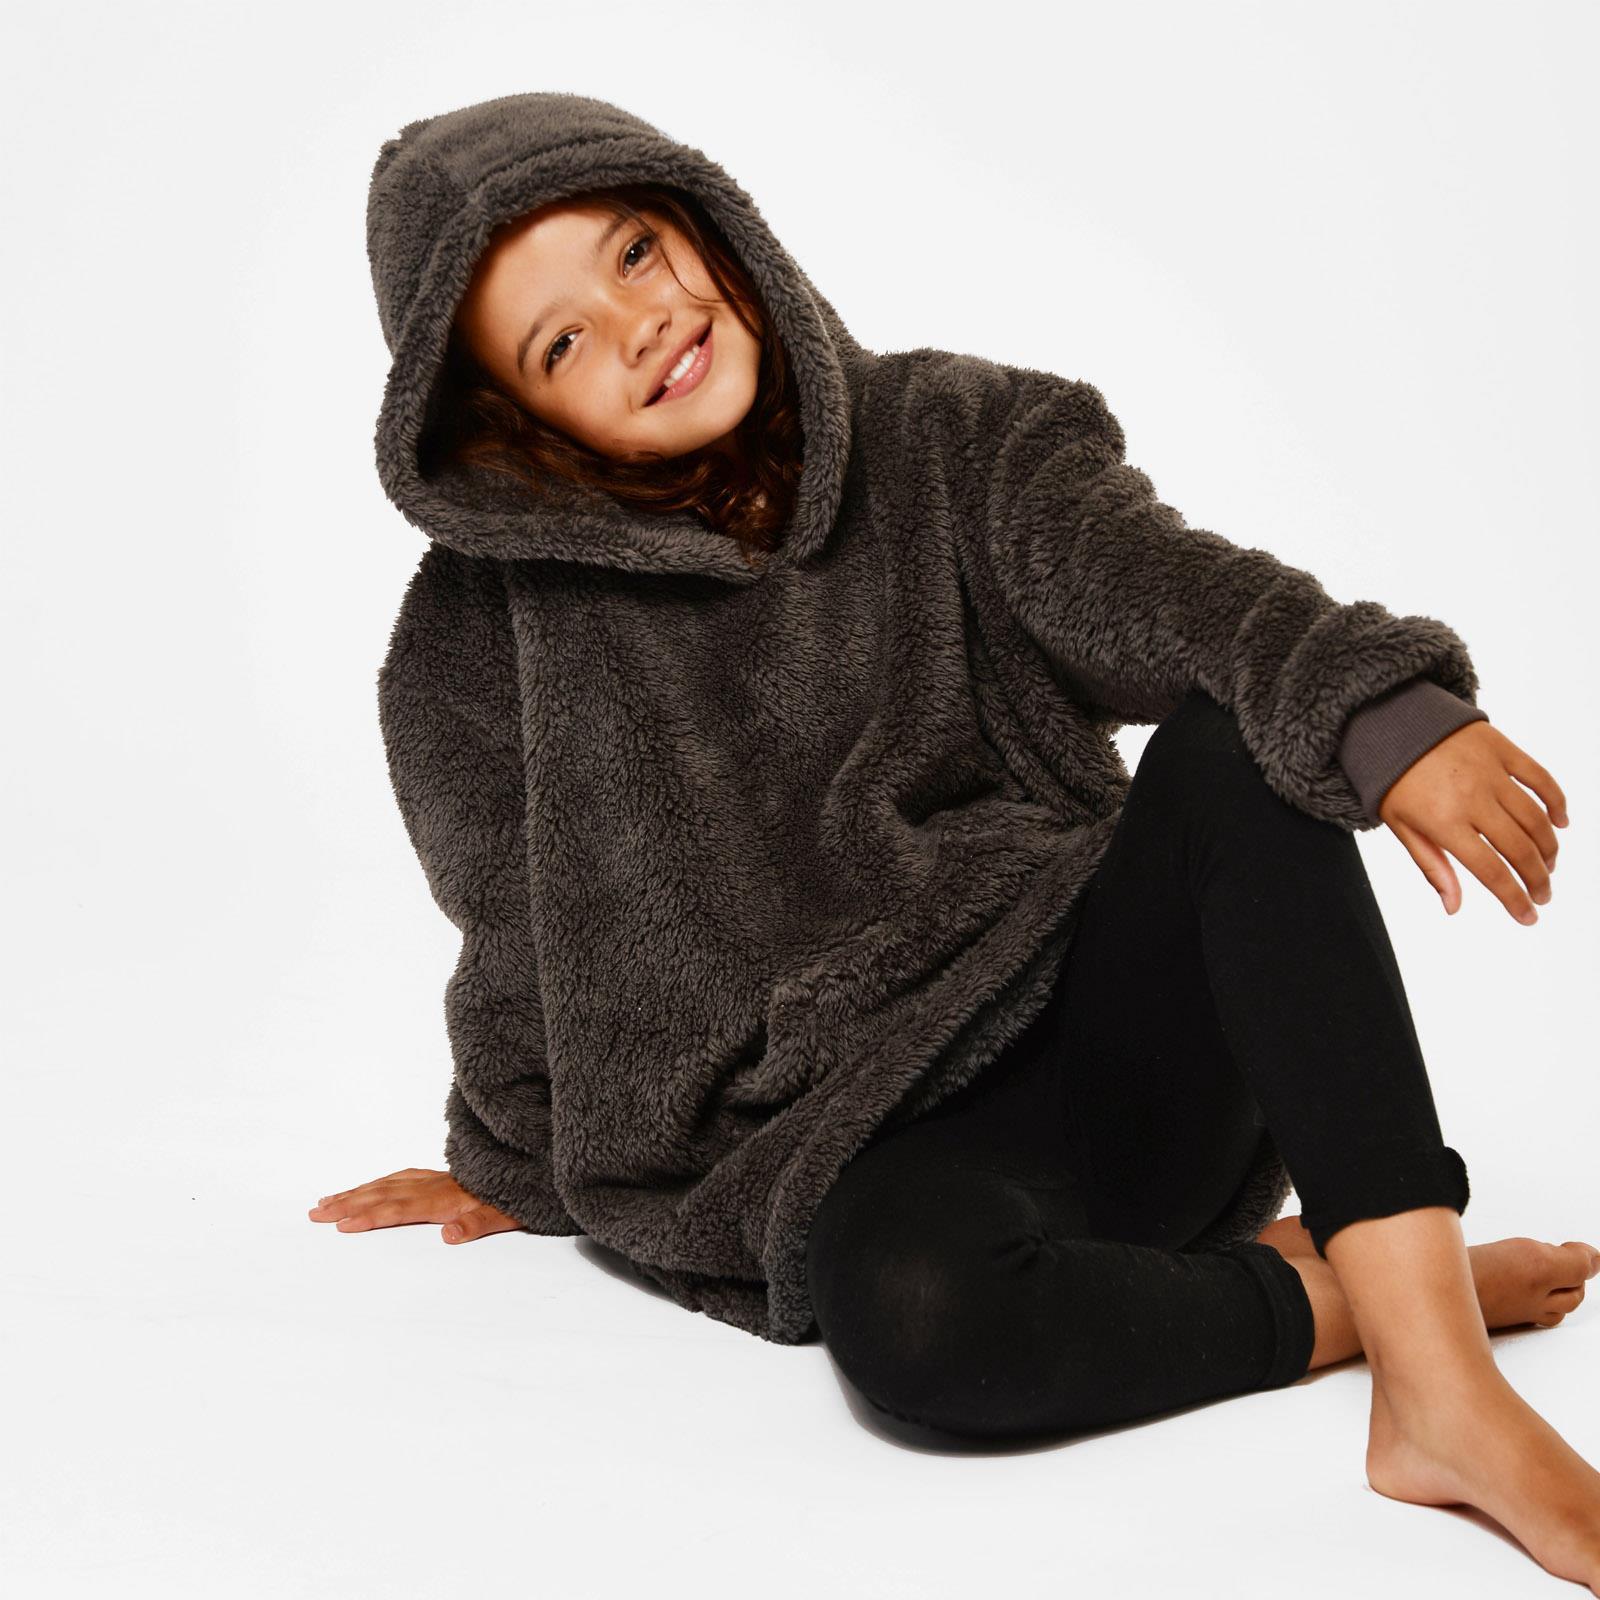 thumbnail 19 - Brentfords-Teddy-Fleece-Hoodie-Blanket-Oversized-Giant-Wearable-Adults-Kids-UK